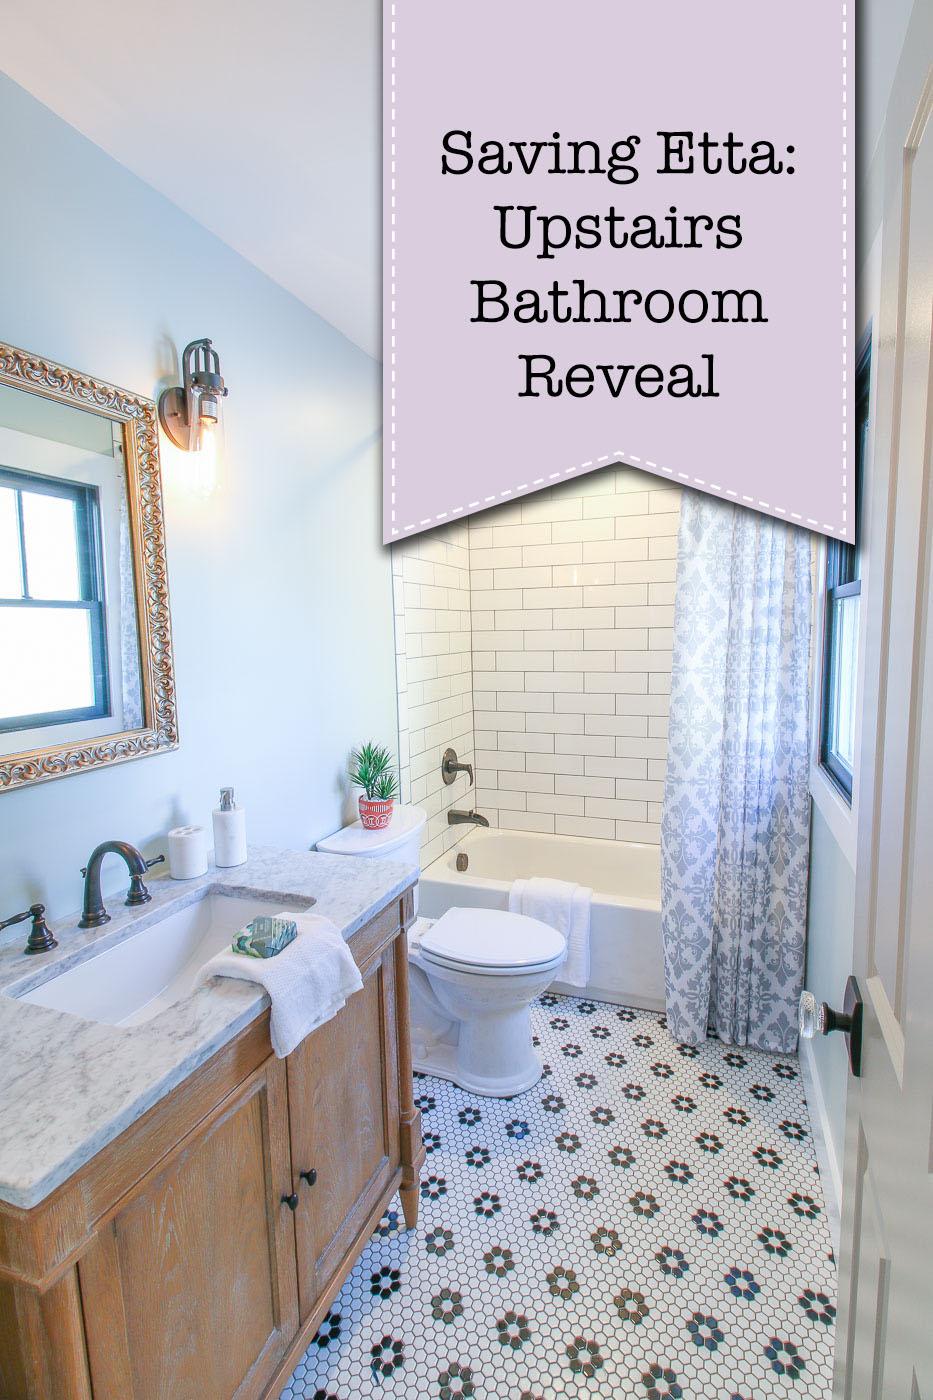 Saving Etta Upstairs Bathroom Reveal